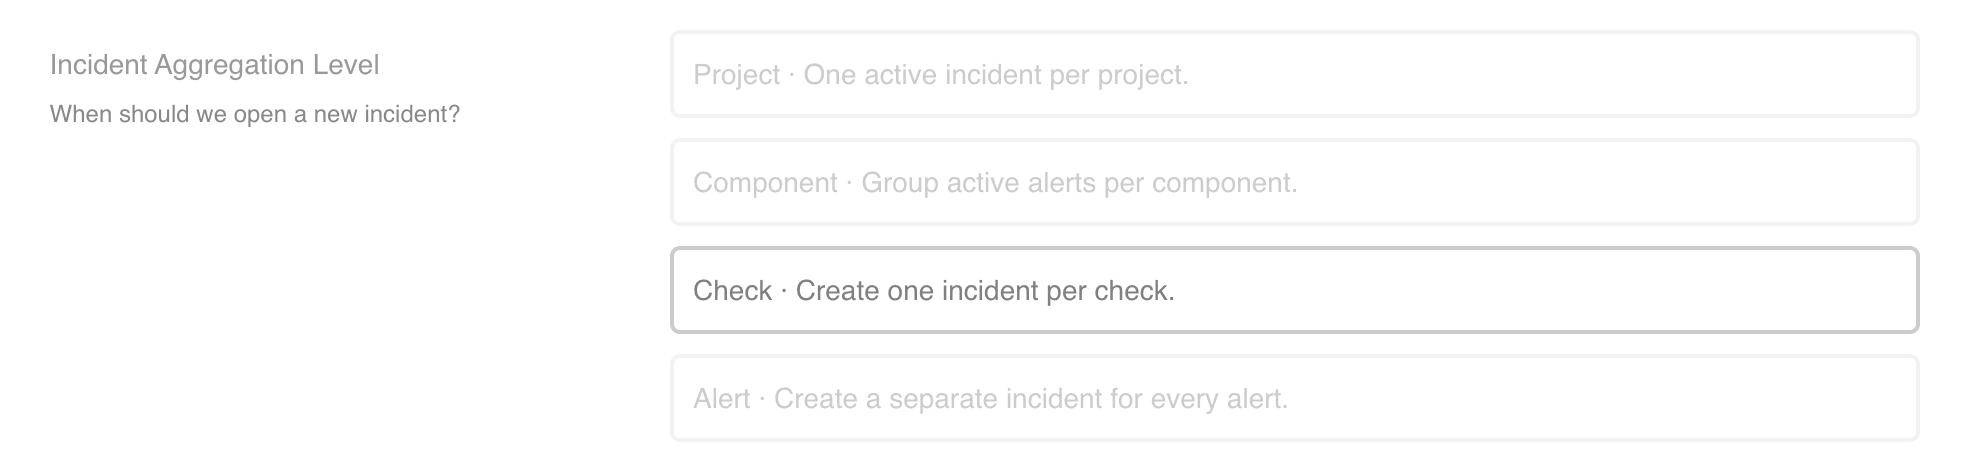 Incident Aggregation]